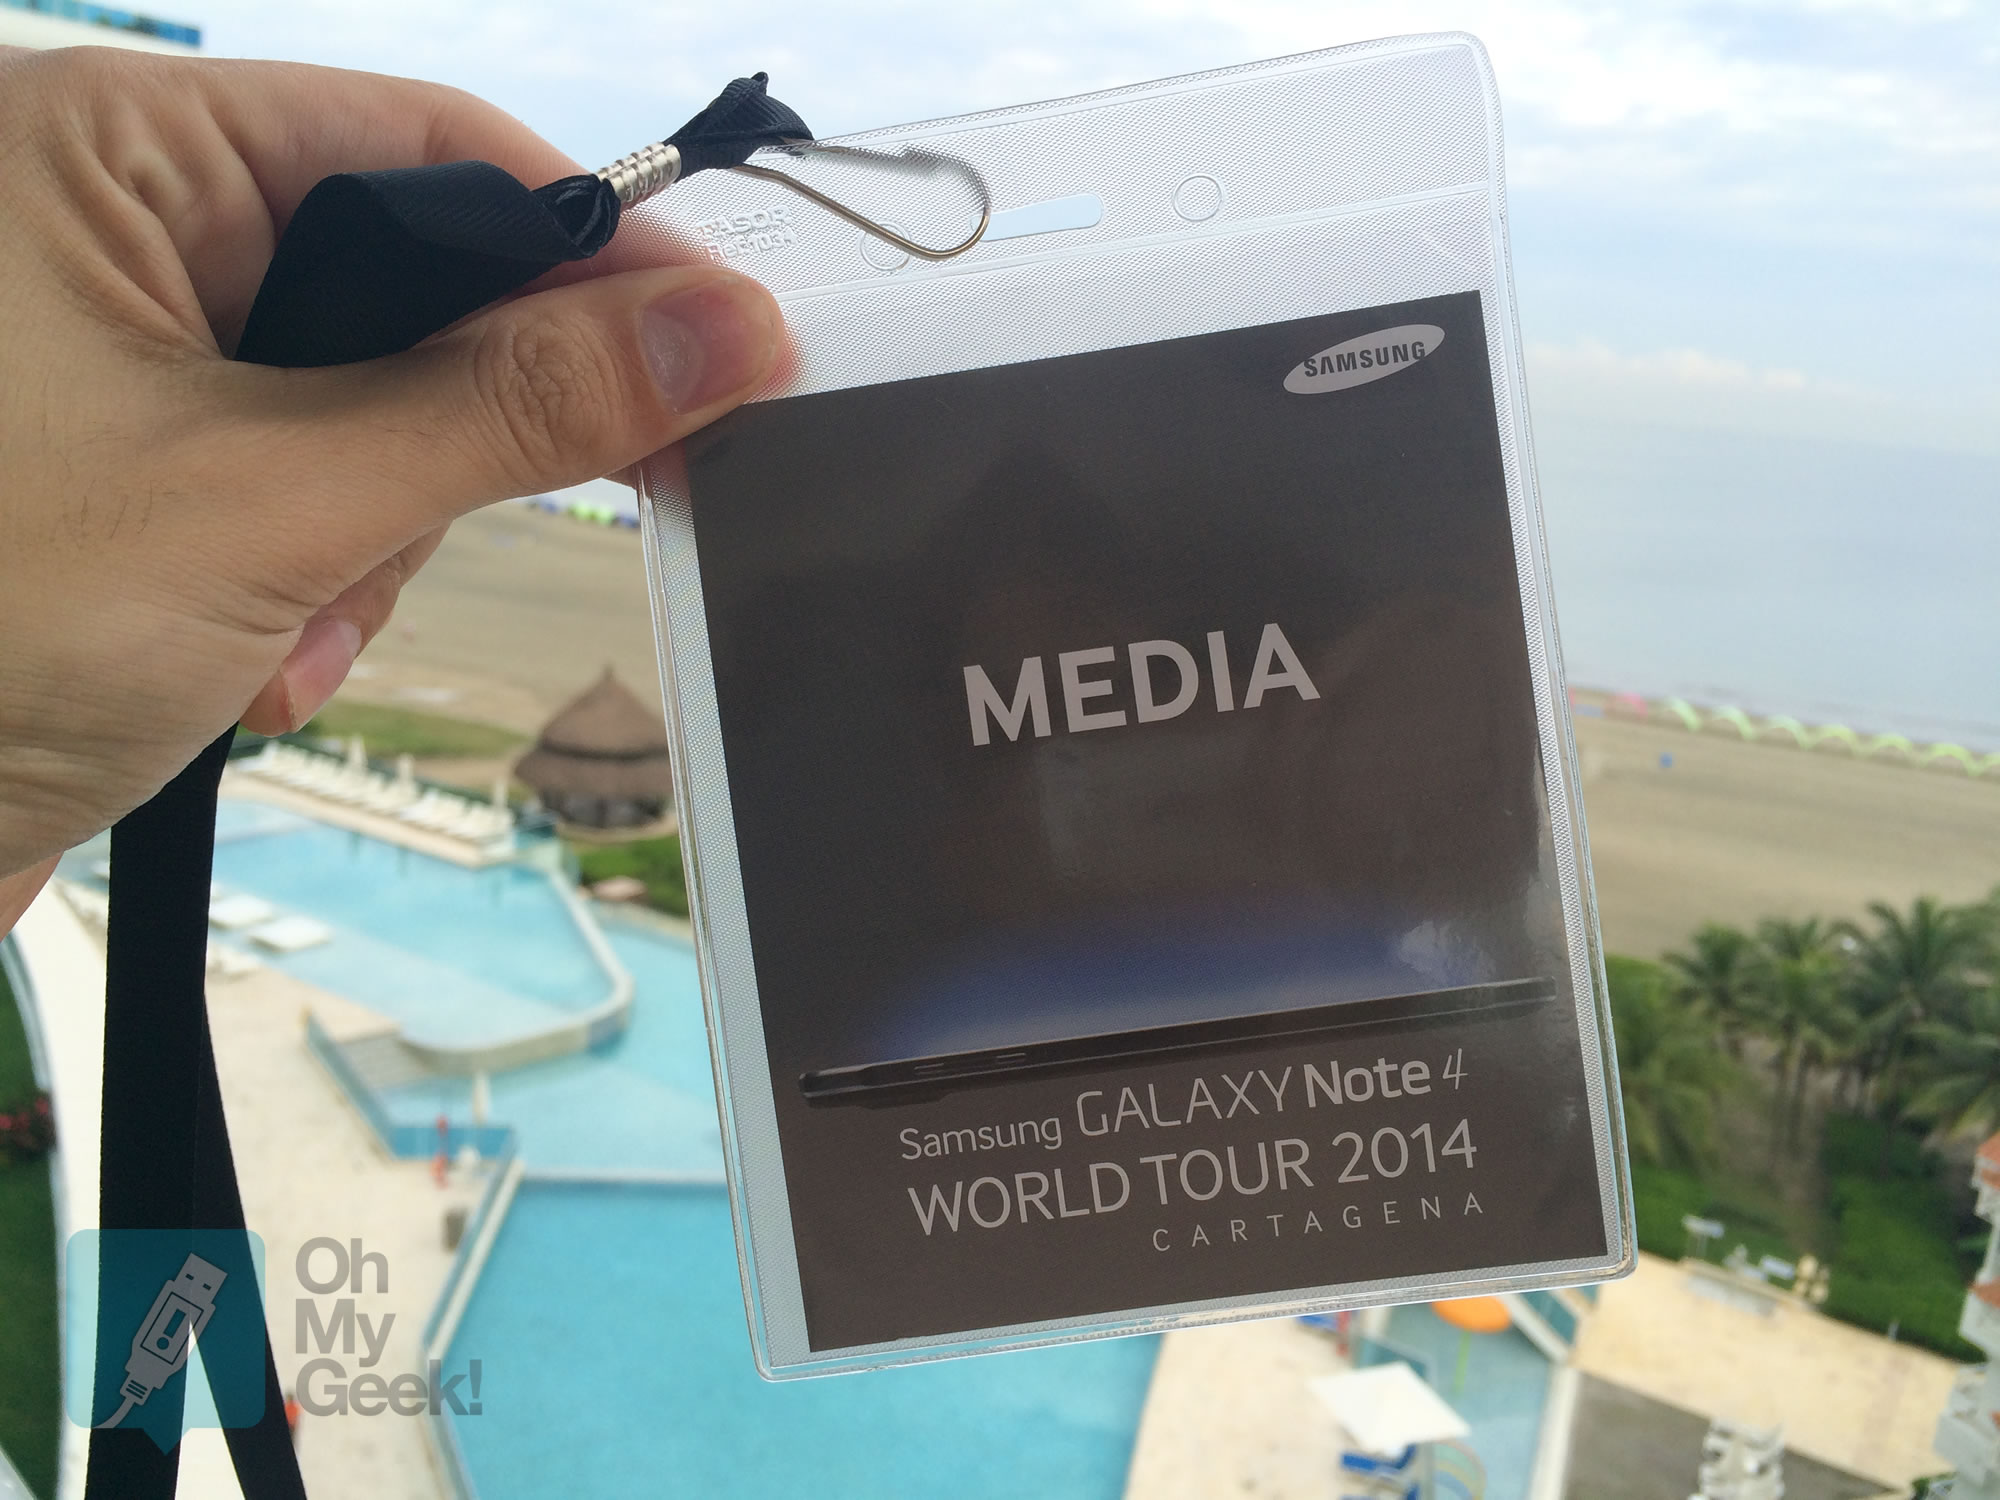 GALAXY World Tour 2014 OhMyGeek!